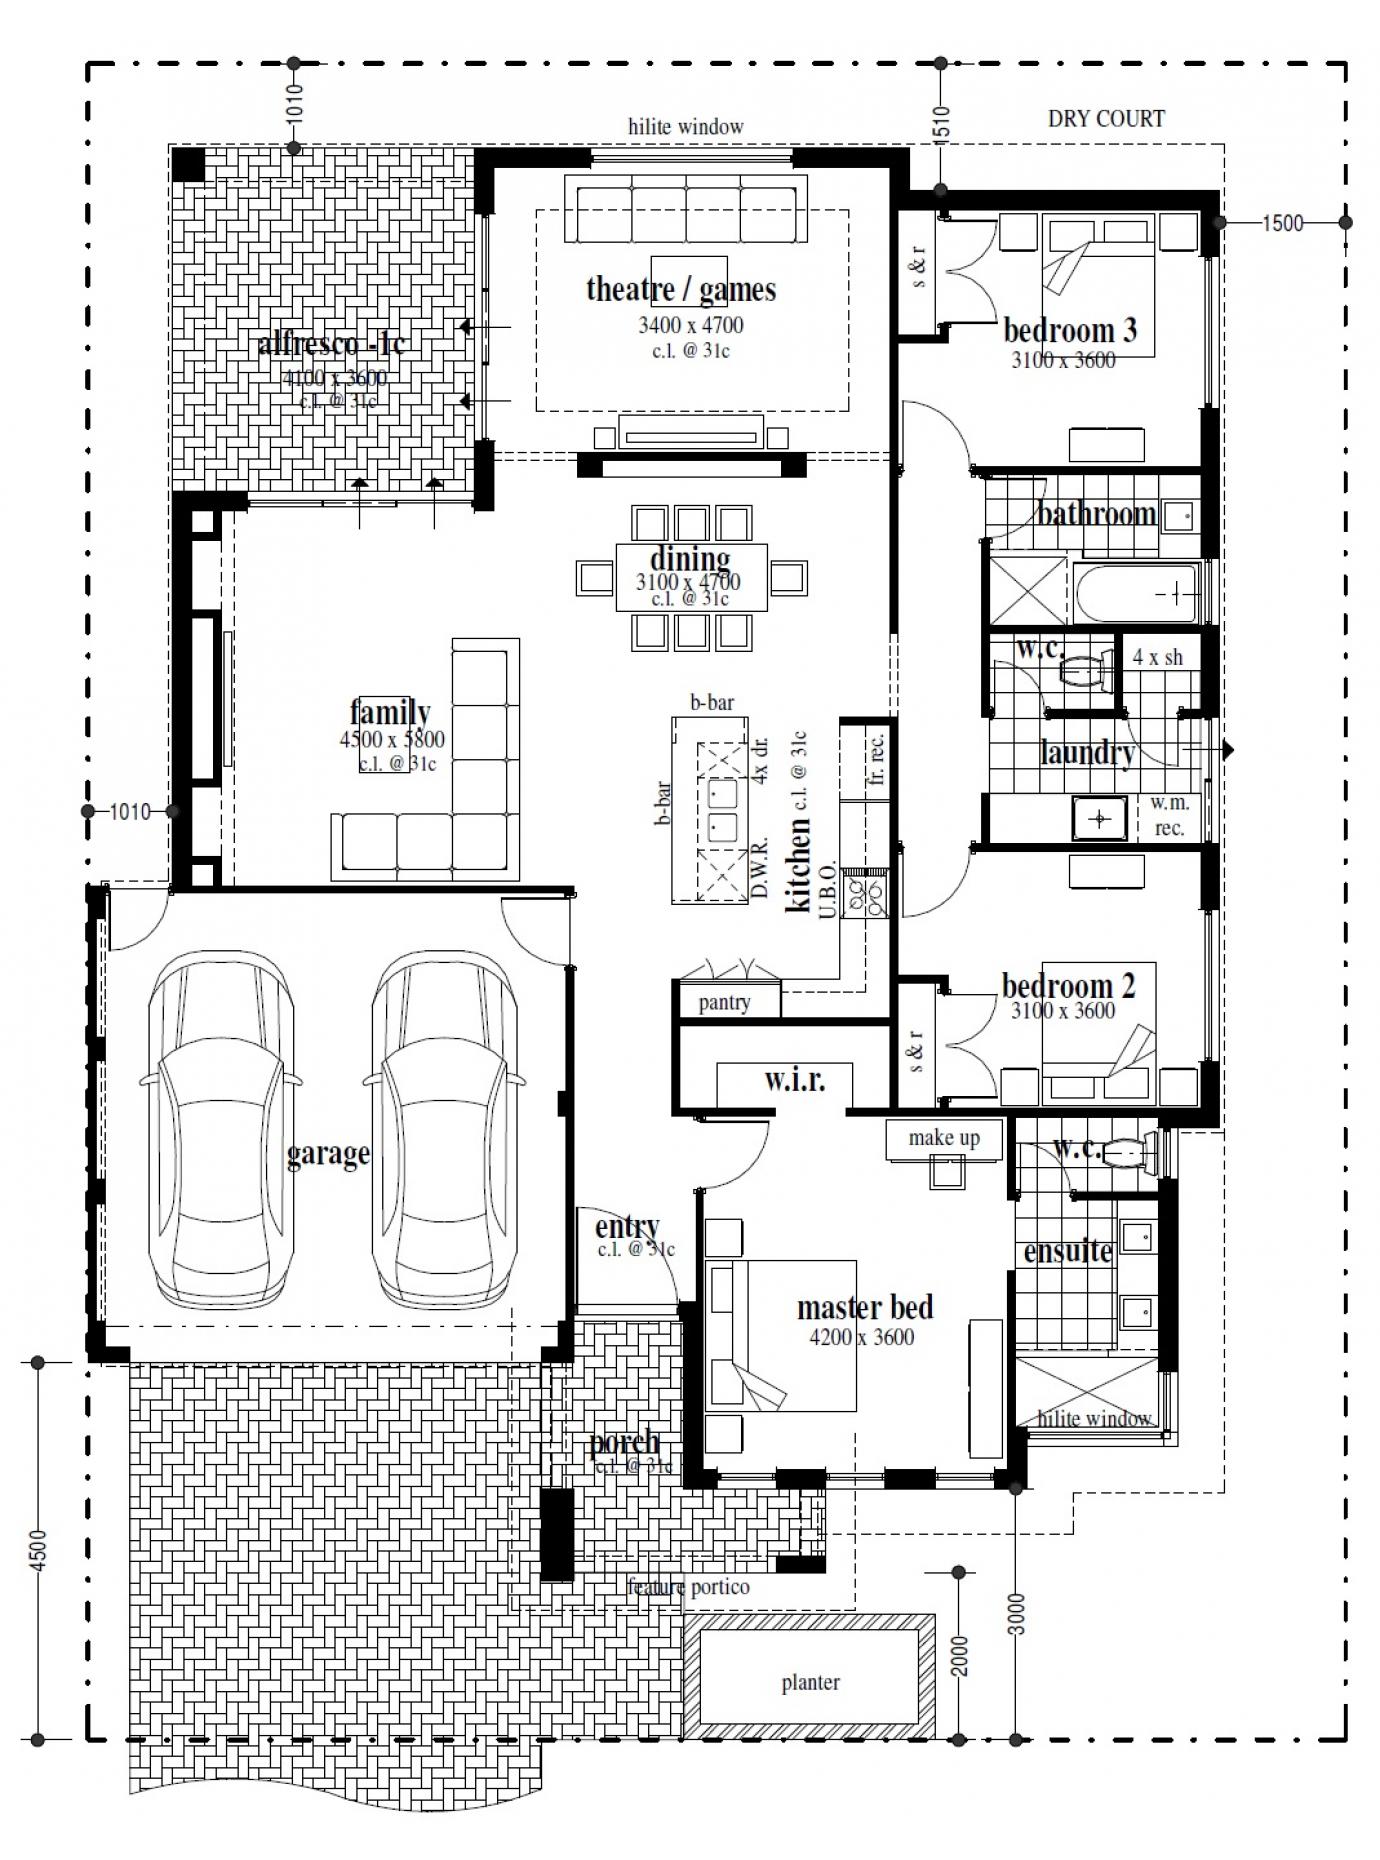 Allara Display Display Home By Start Right Homes In Allara Eglinton Perth Newhousing Com Au House Plans Australia Display Homes Home Design Plans